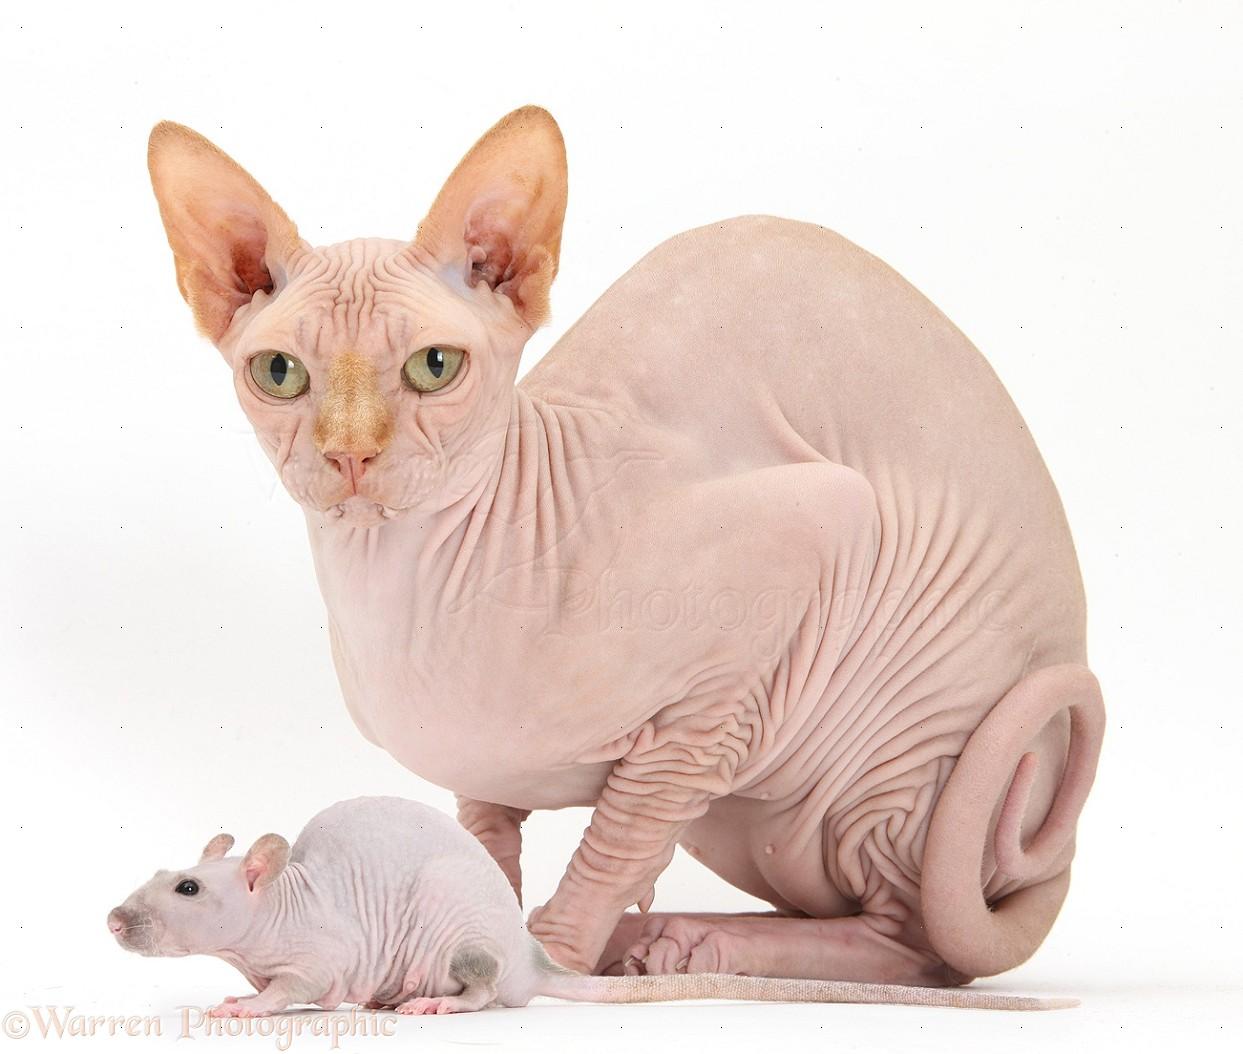 Sphynx Cat: Sphynx Sphynx Cat And Sphynx Rat Breed